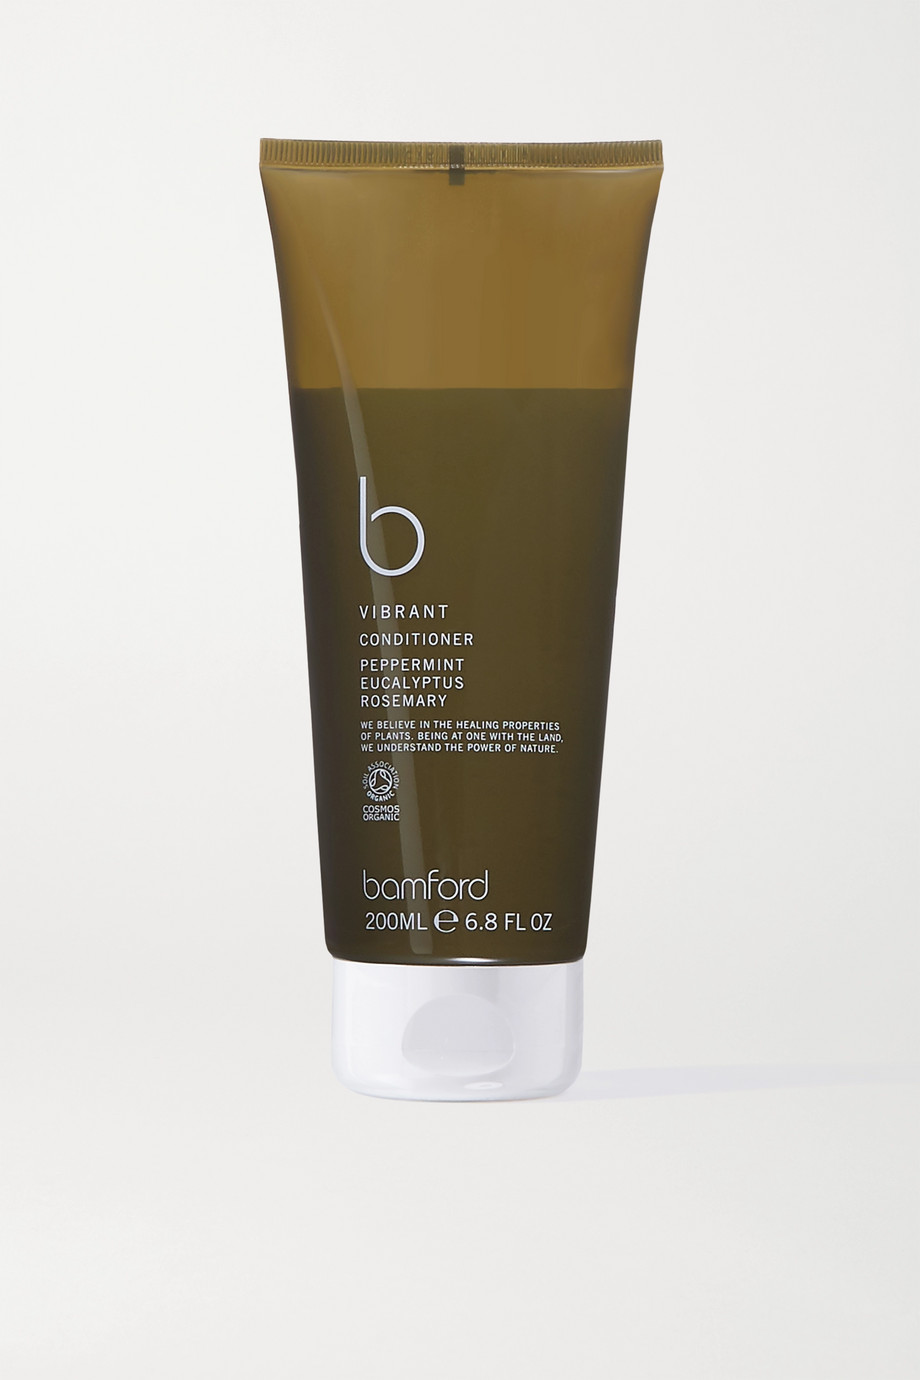 Bamford B Vibrant Conditioner, 200 ml – Conditioner